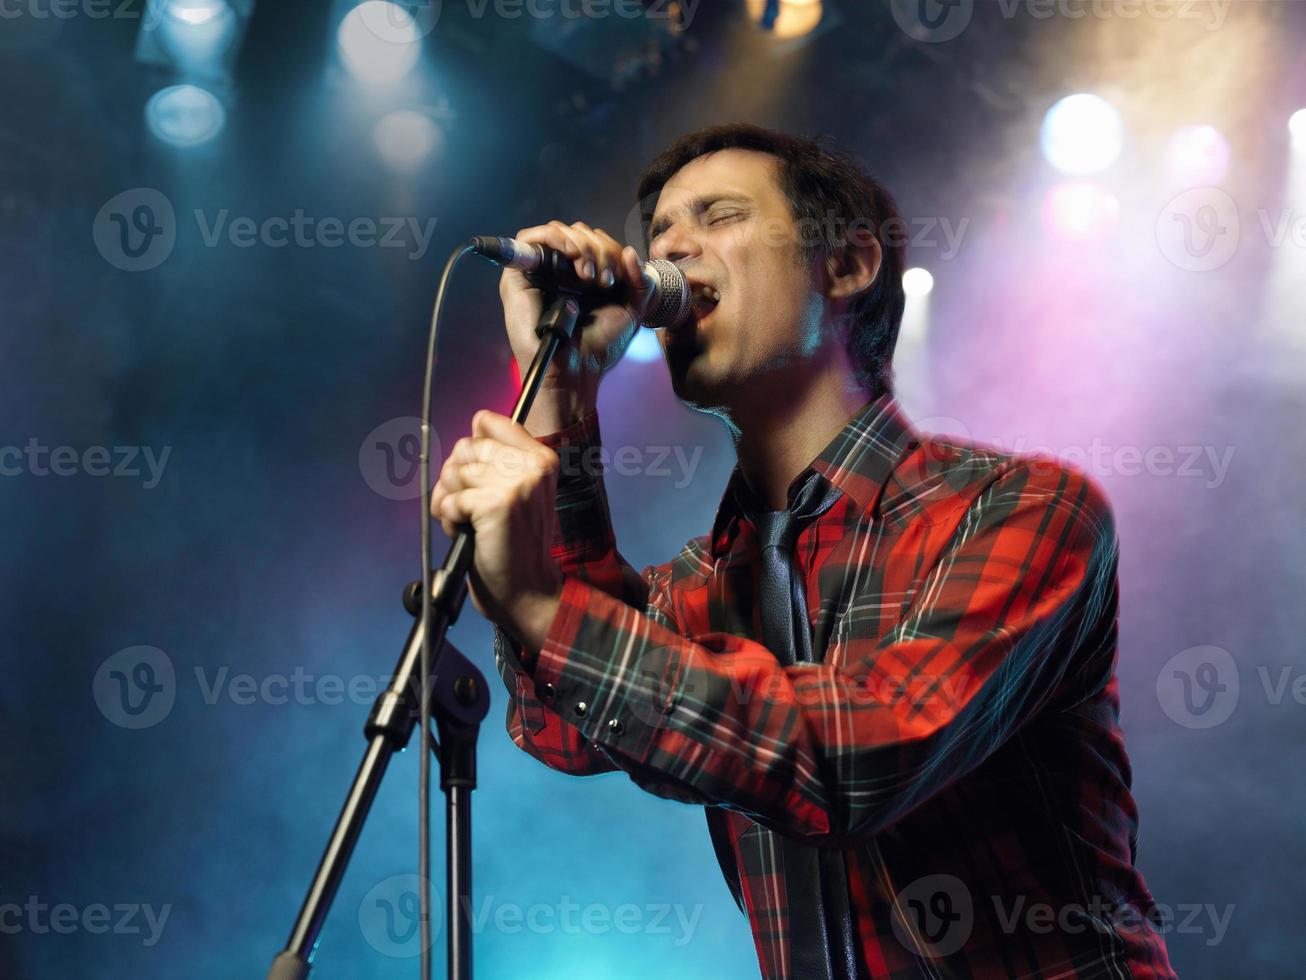 ung man sjunger in i mikrofon foto